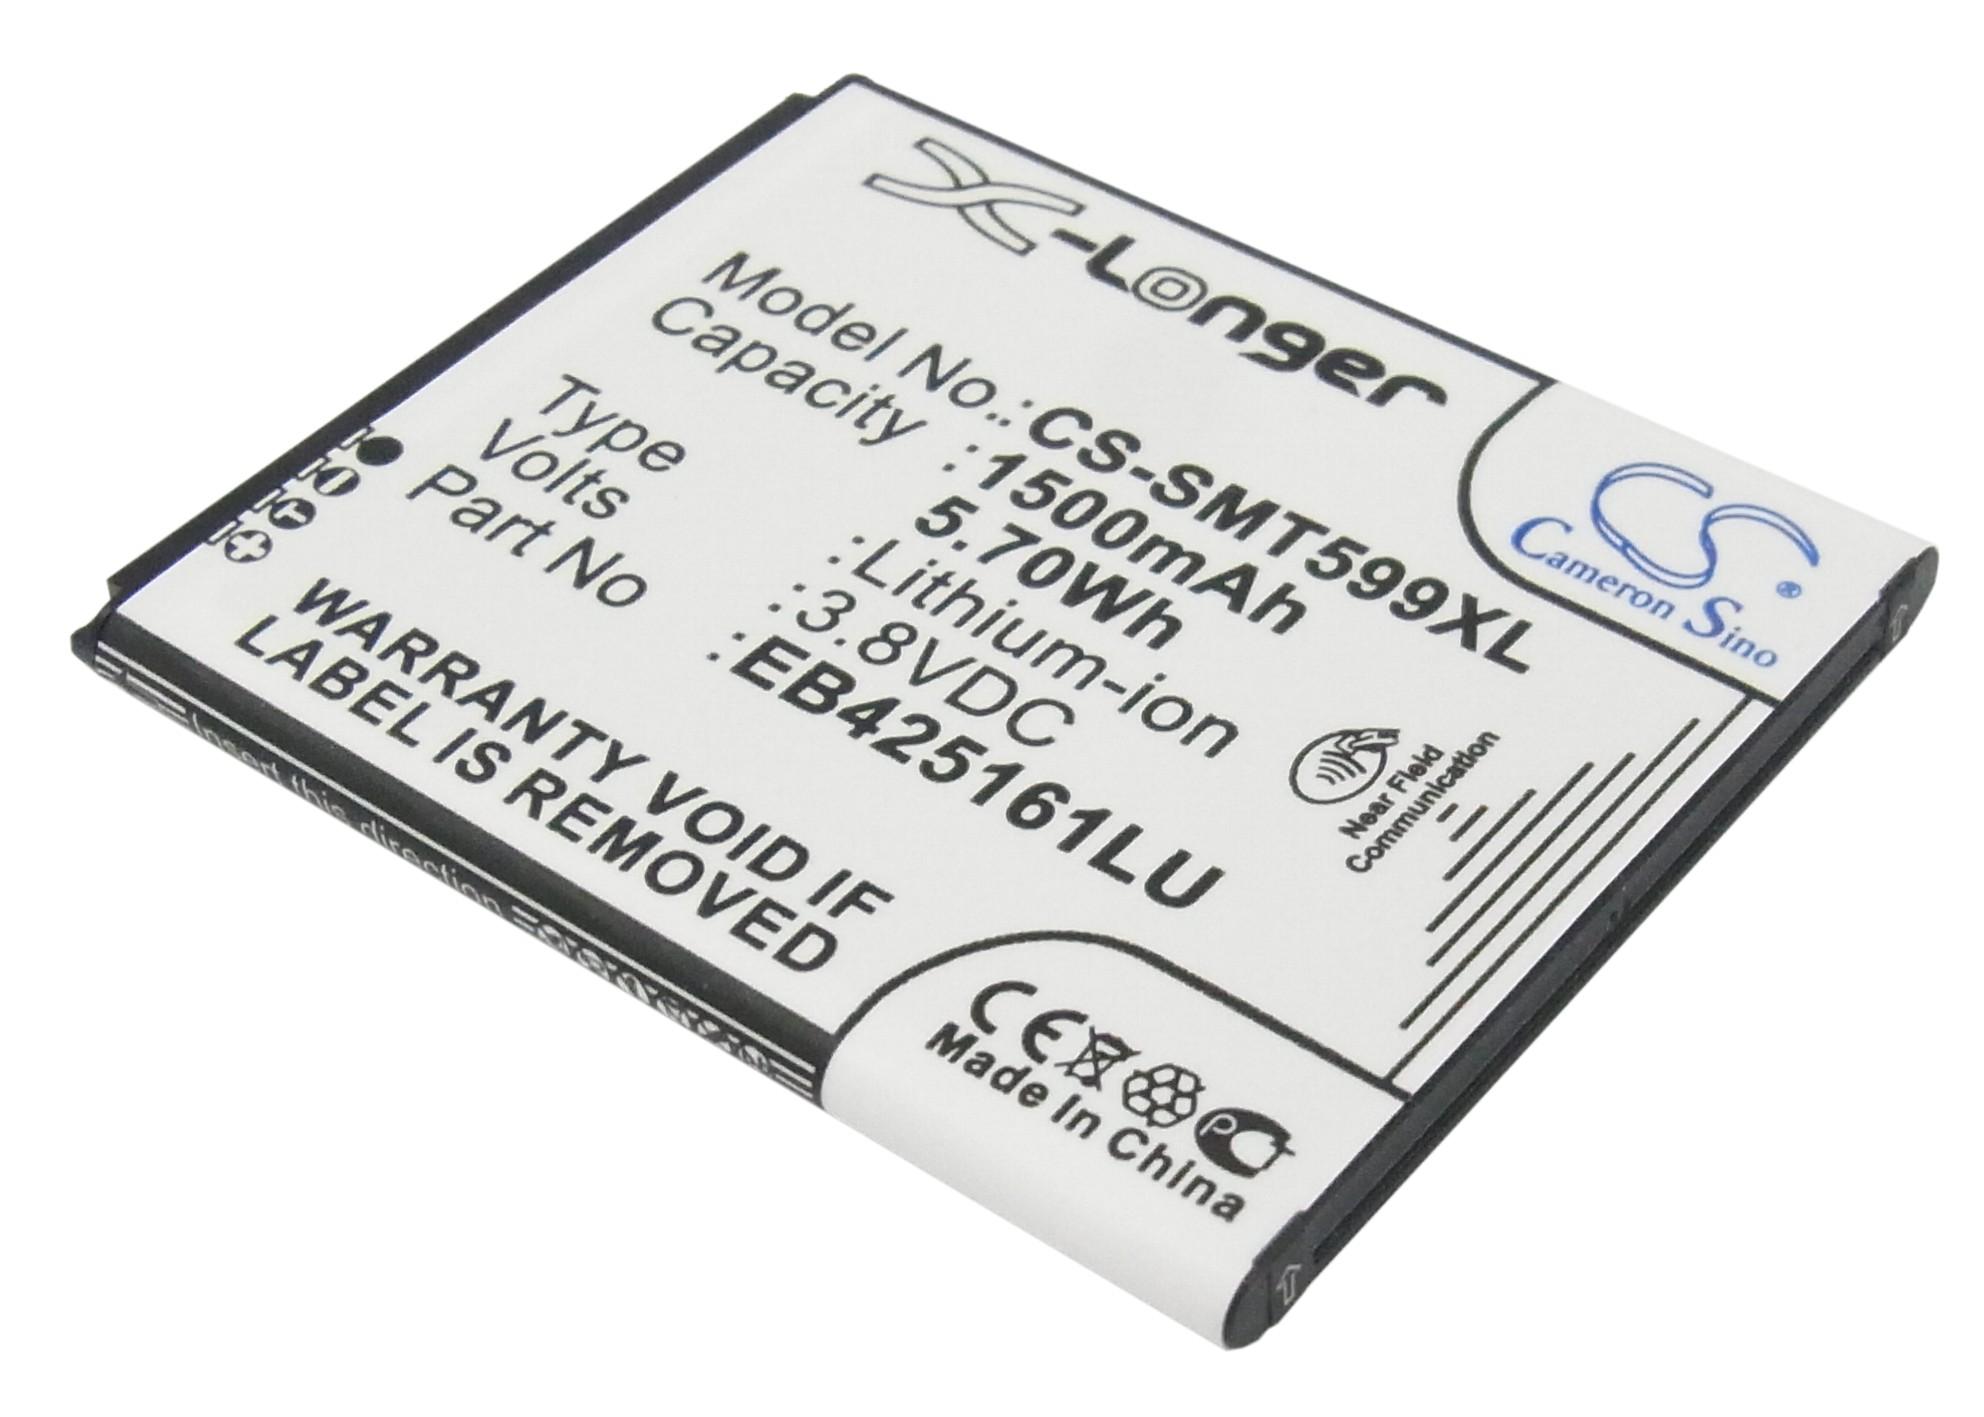 Cameron Sino baterie do mobilů pro SAMSUNG GT-I8160 3.8V Li-ion 1500mAh černá - neoriginální